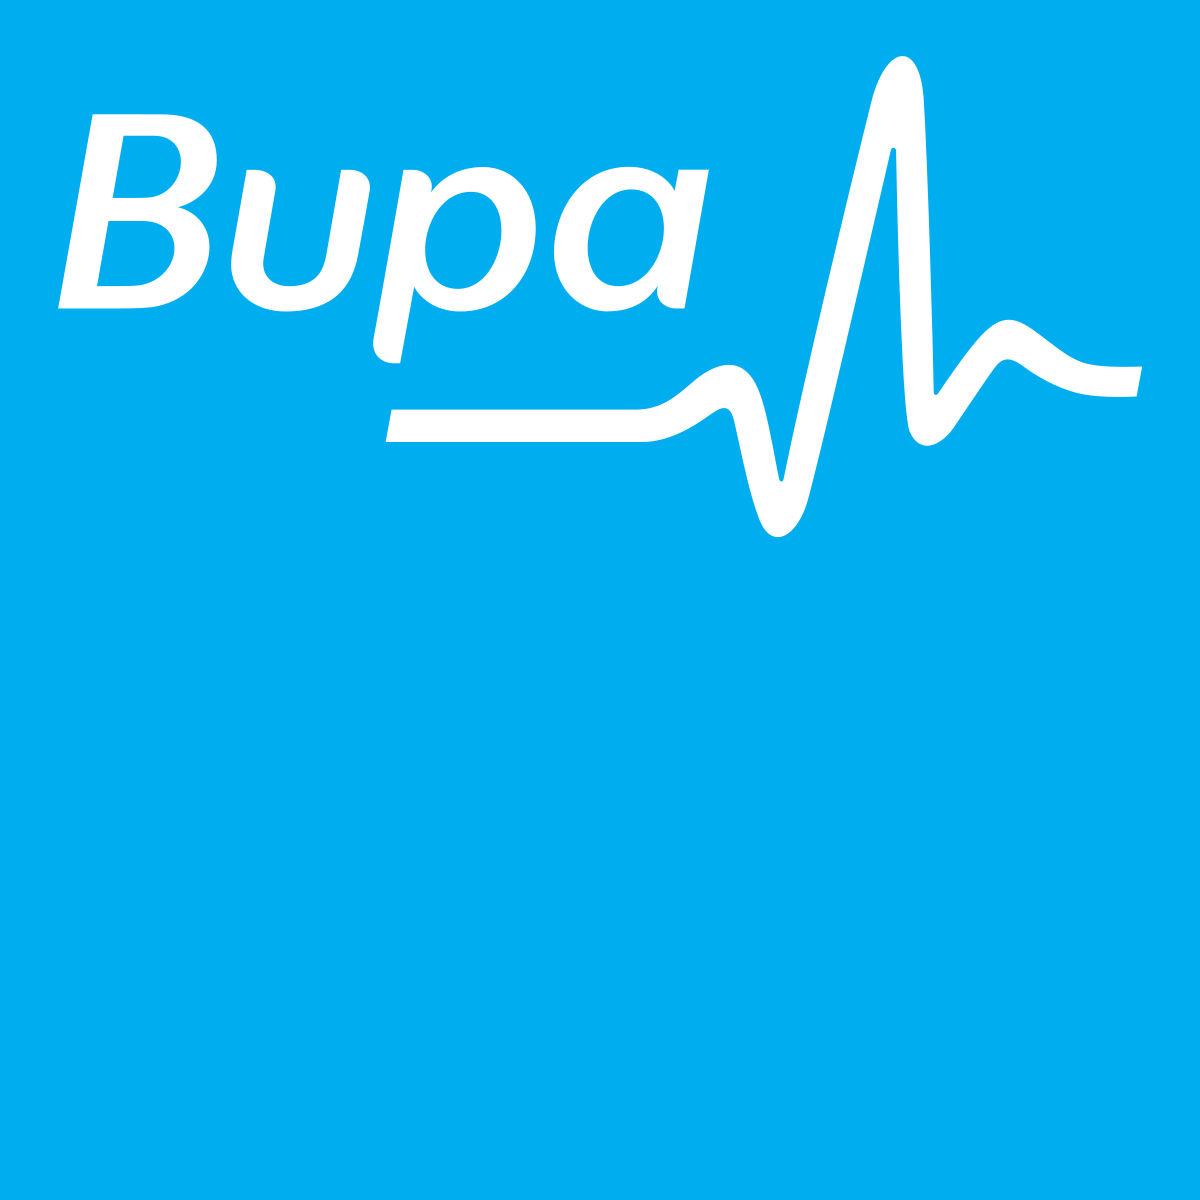 Bupa (google image)